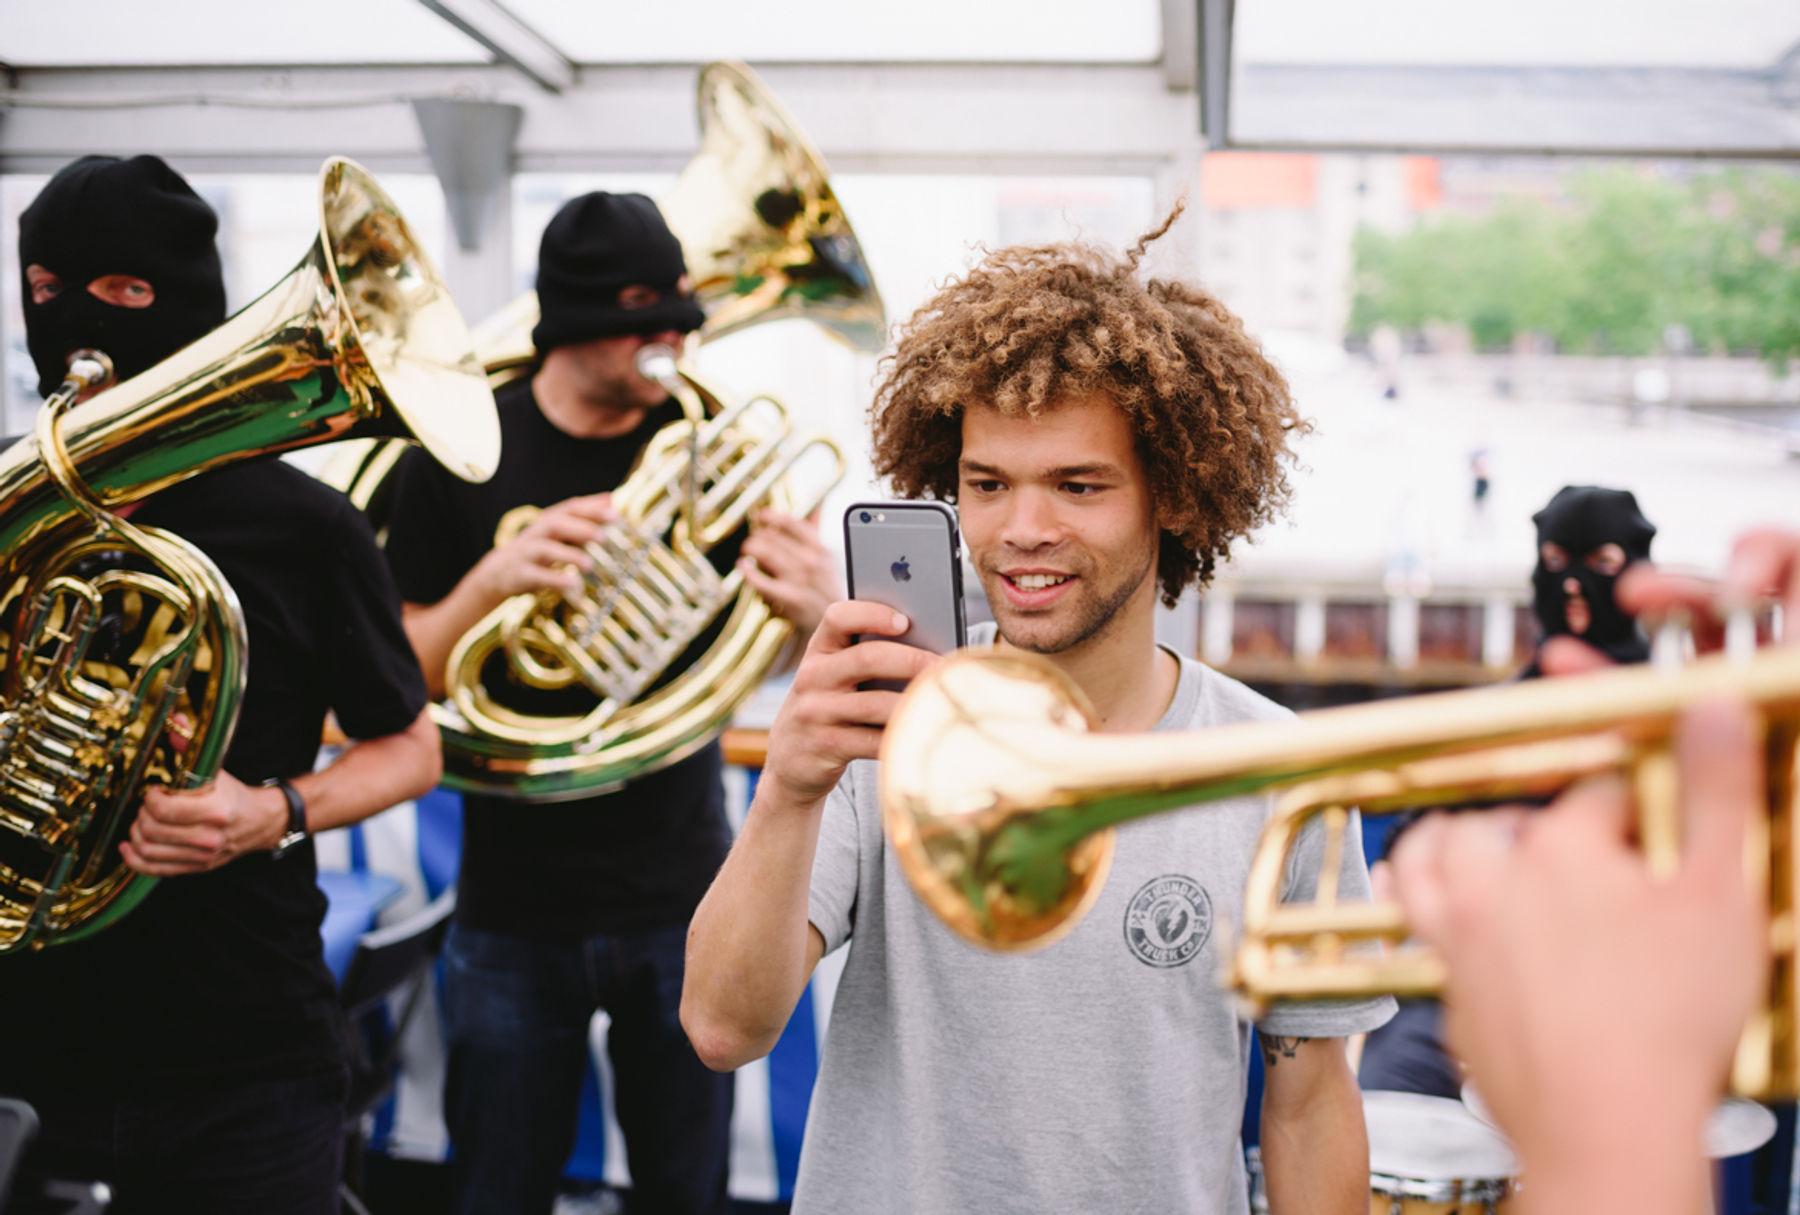 _IHC5632e-Nassim-Guammaz-Nike-SB-Copenhagen-Open-Day-4-July-2015-Photographer-Maksim-Kalanep